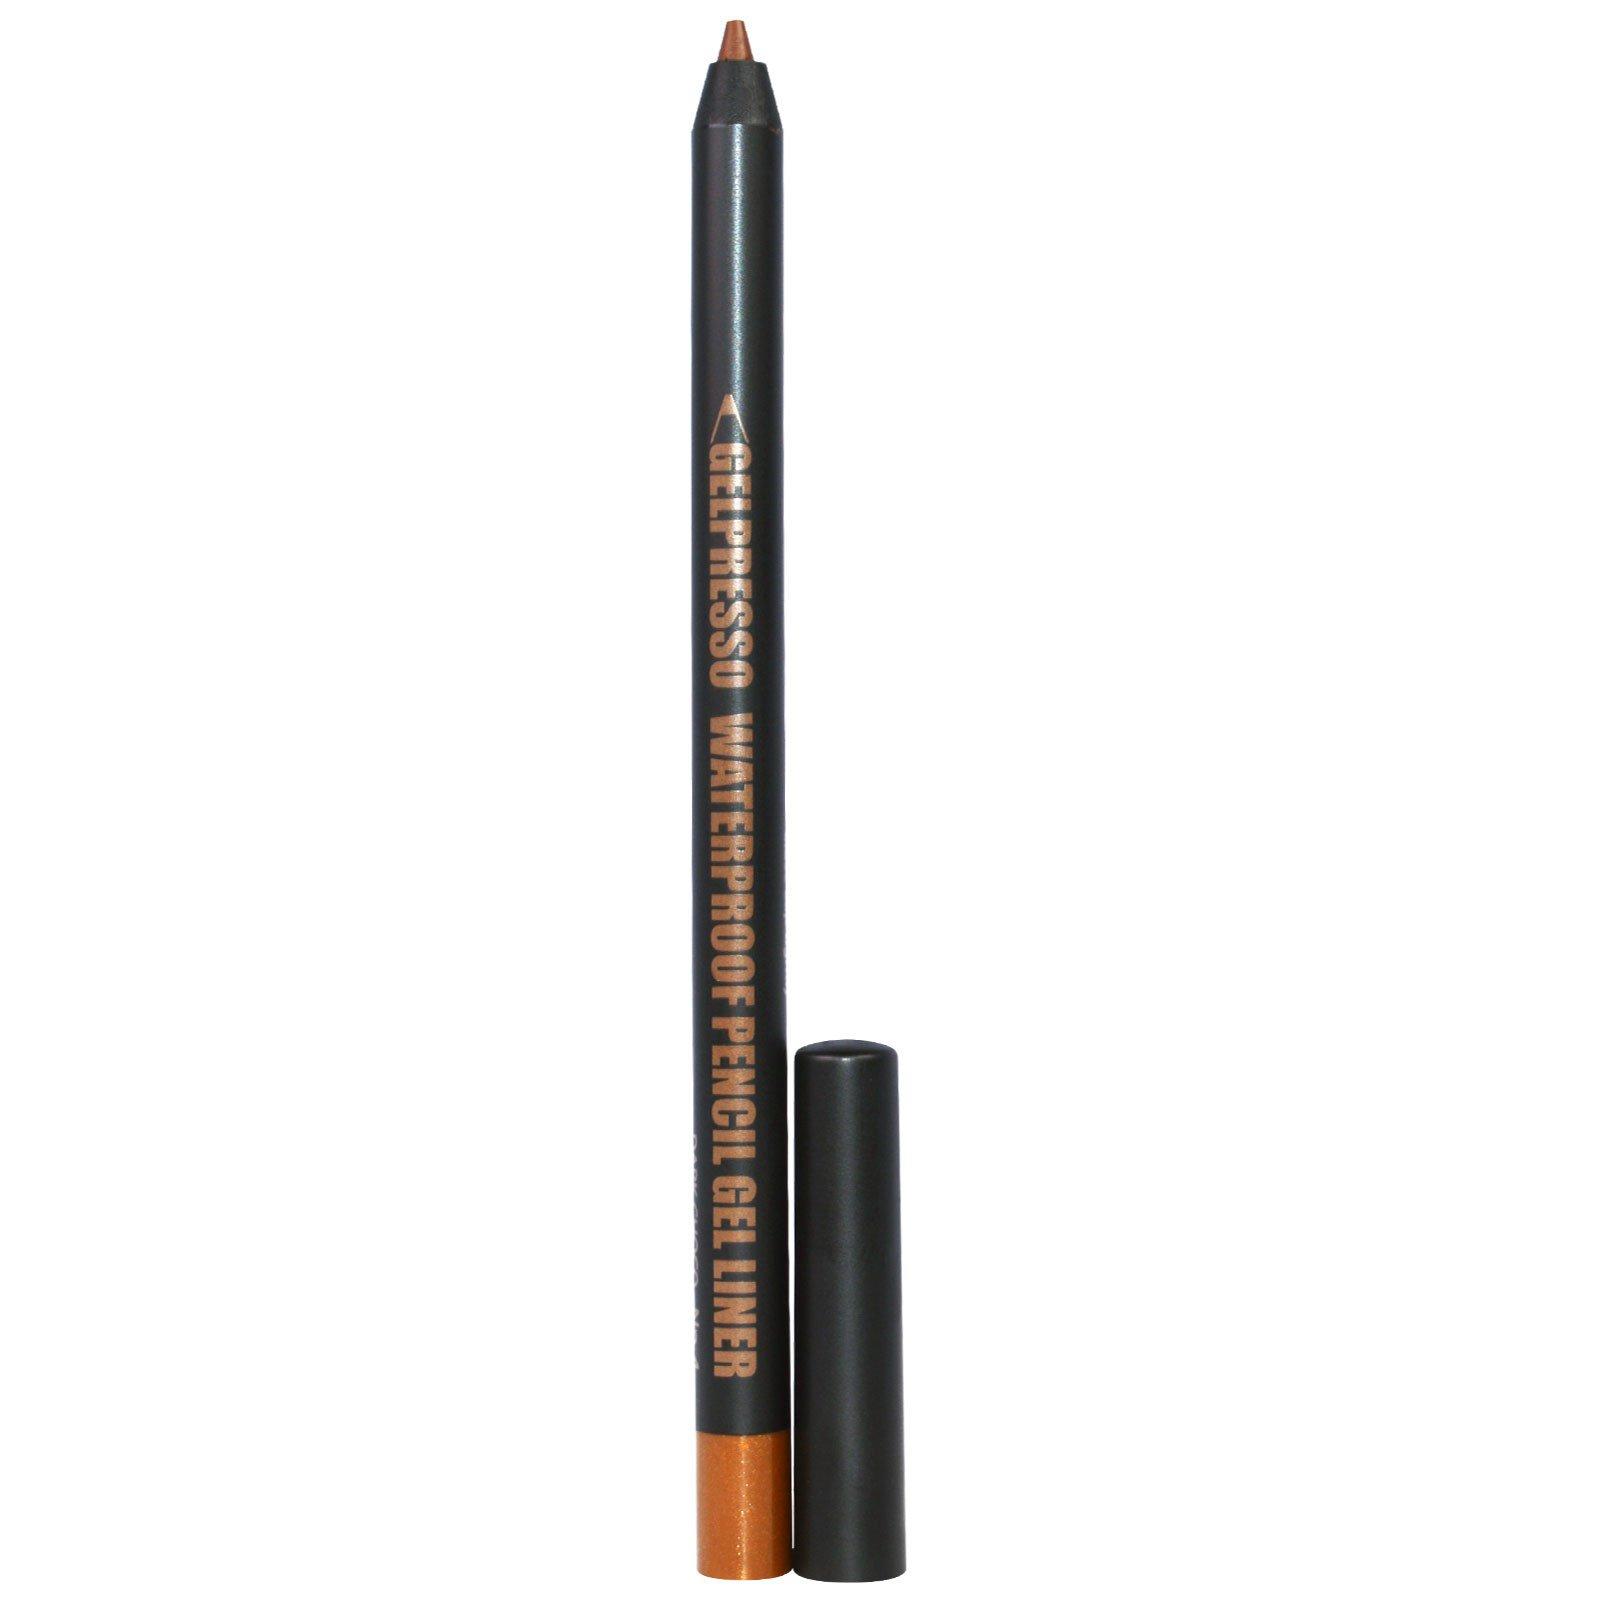 Clio, Gelpresso Waterproof Pencil Gel Liner, Dark Choco, .5 g